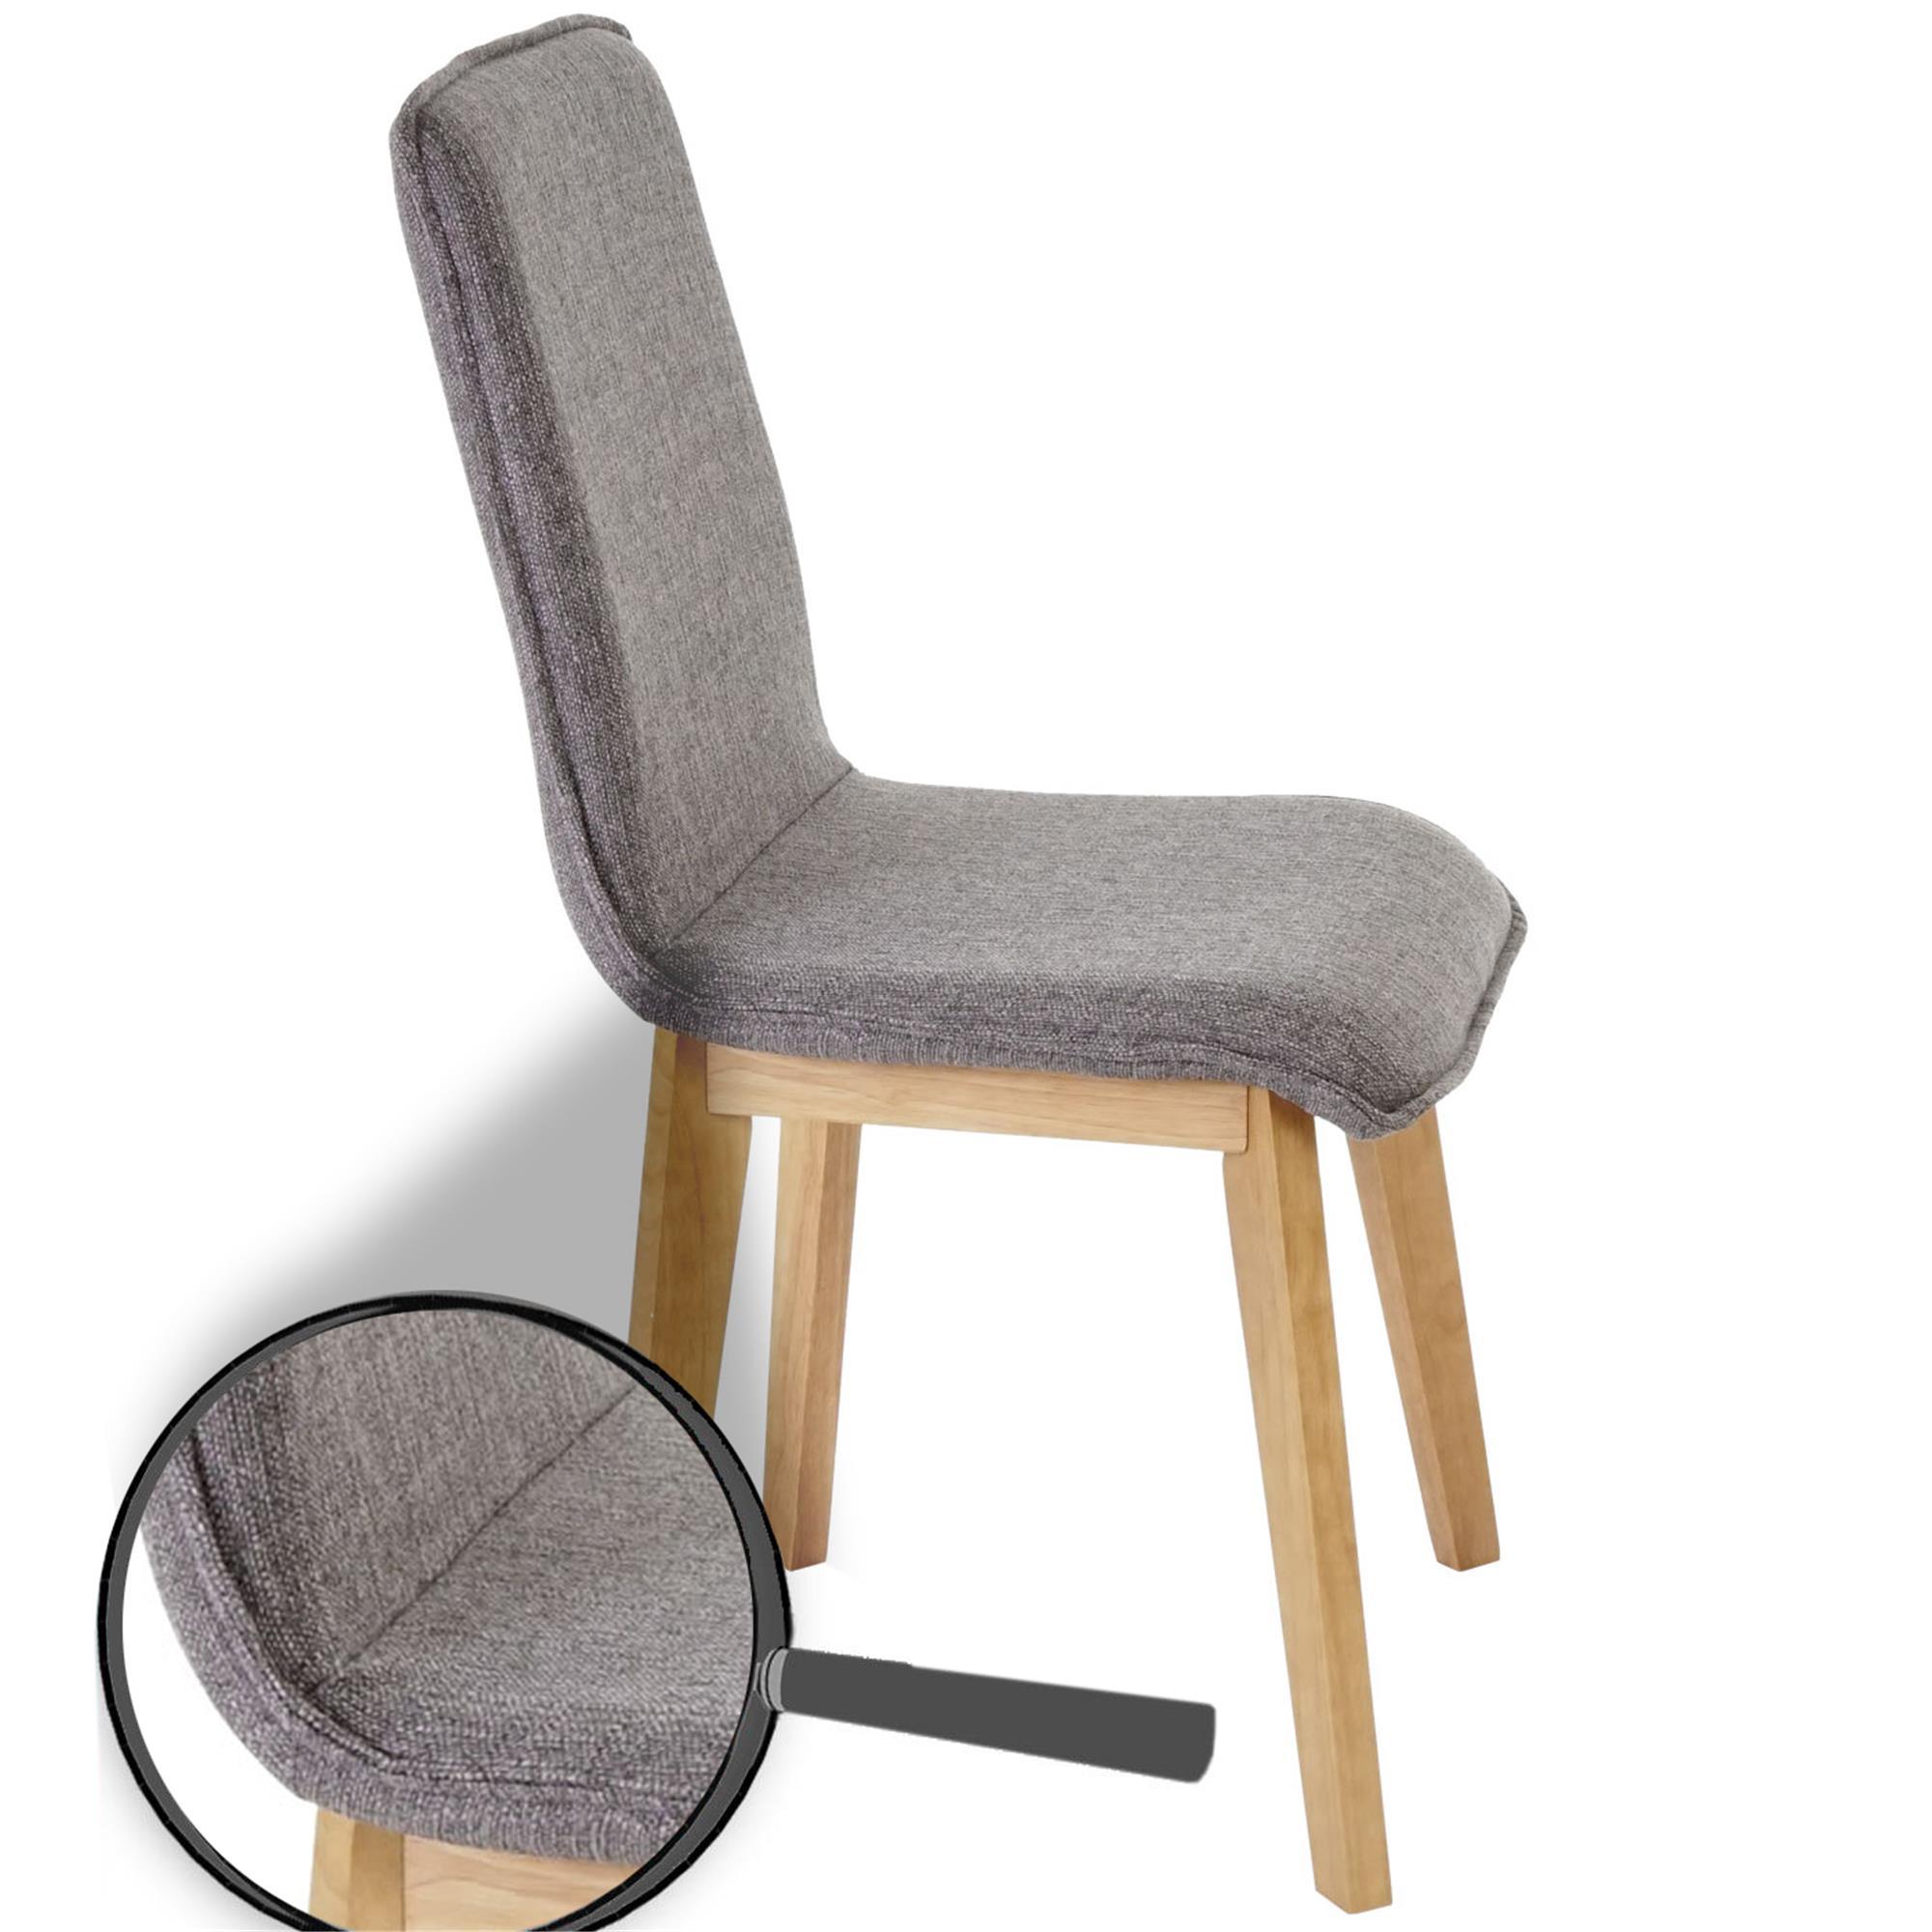 lote 6 sillas de cocina o comedor ford en tela gris